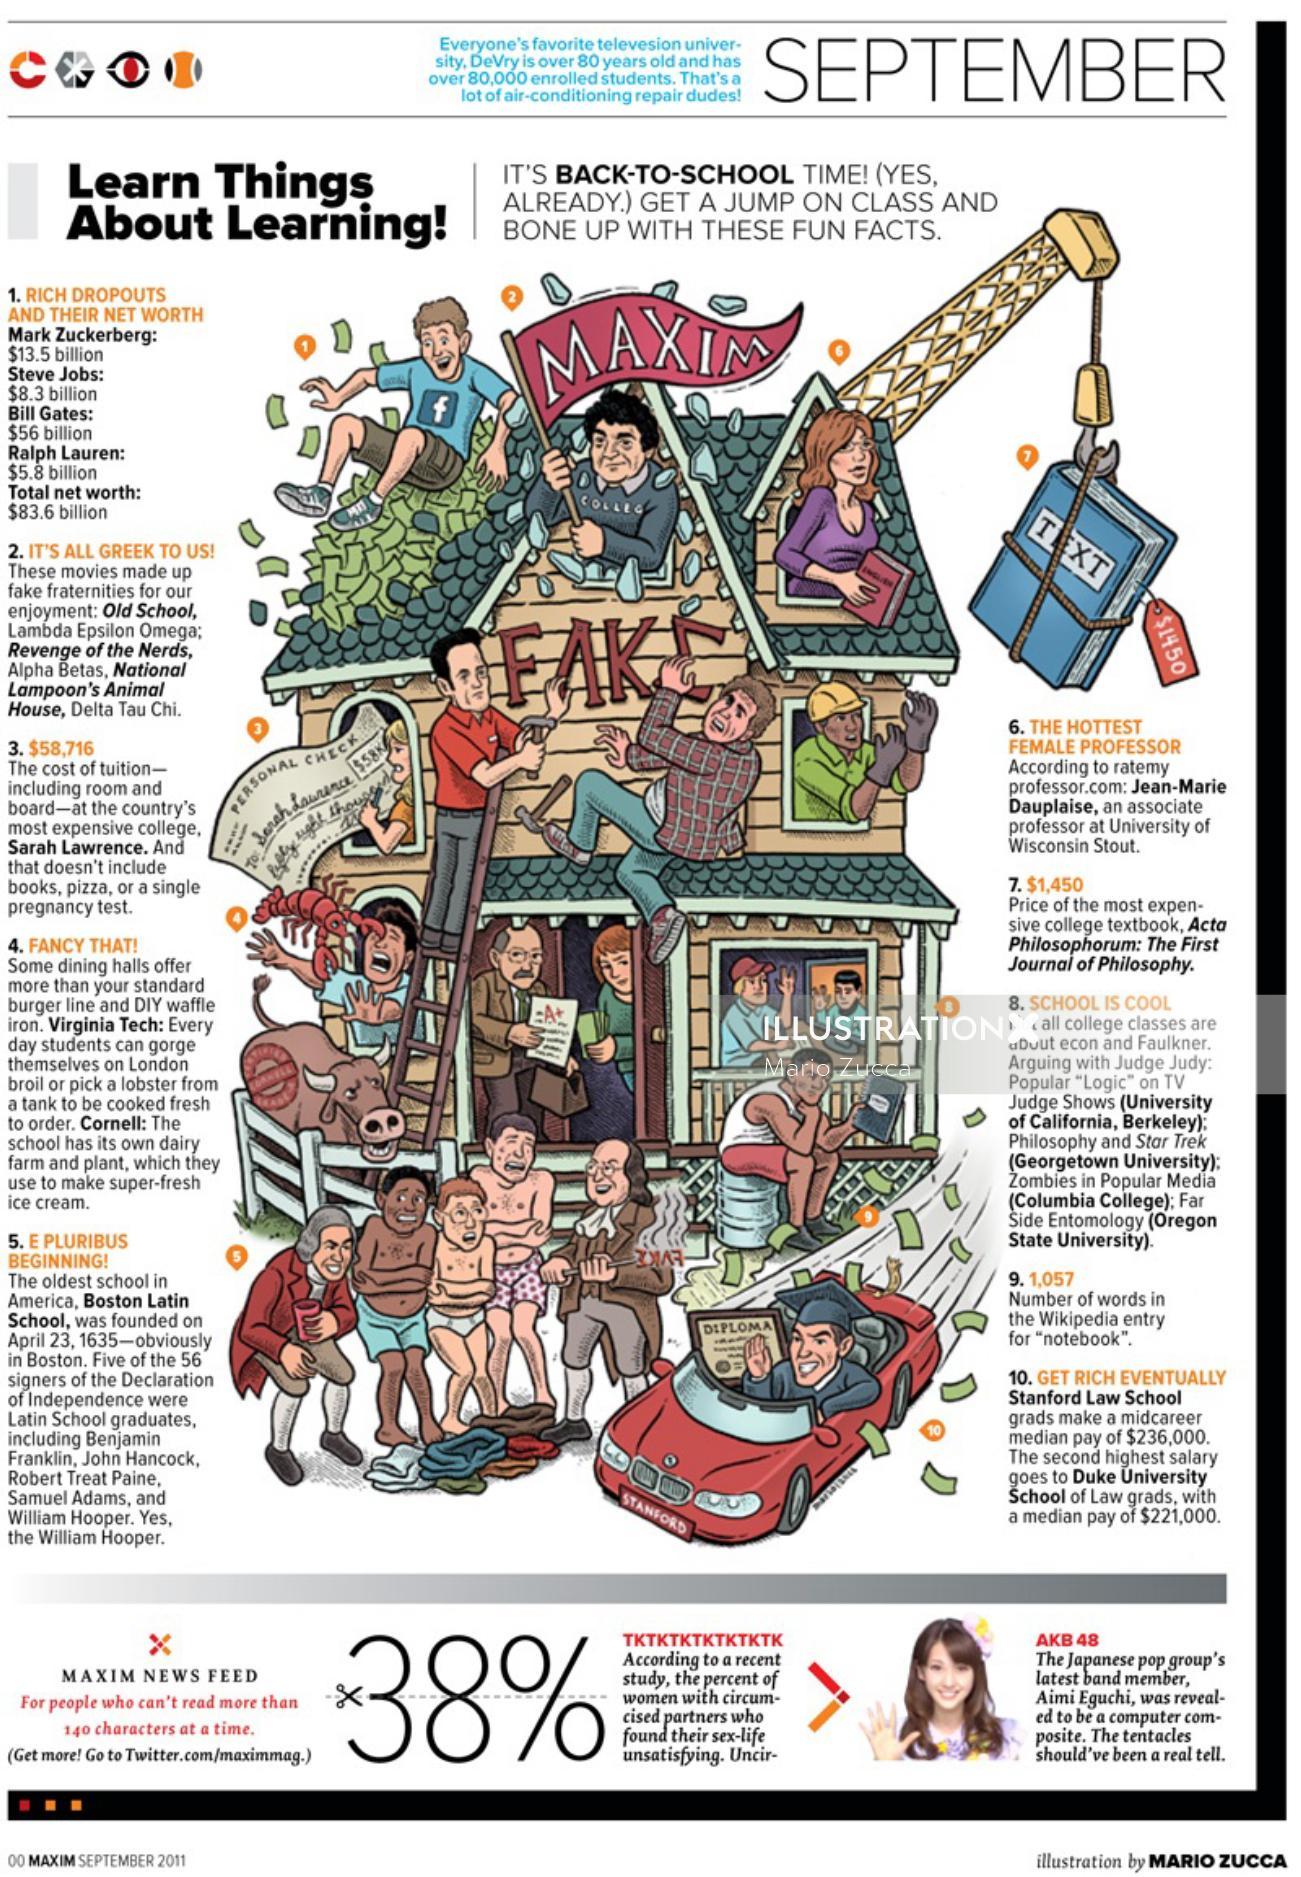 Editorial illustration of fake house - Maxim magazine